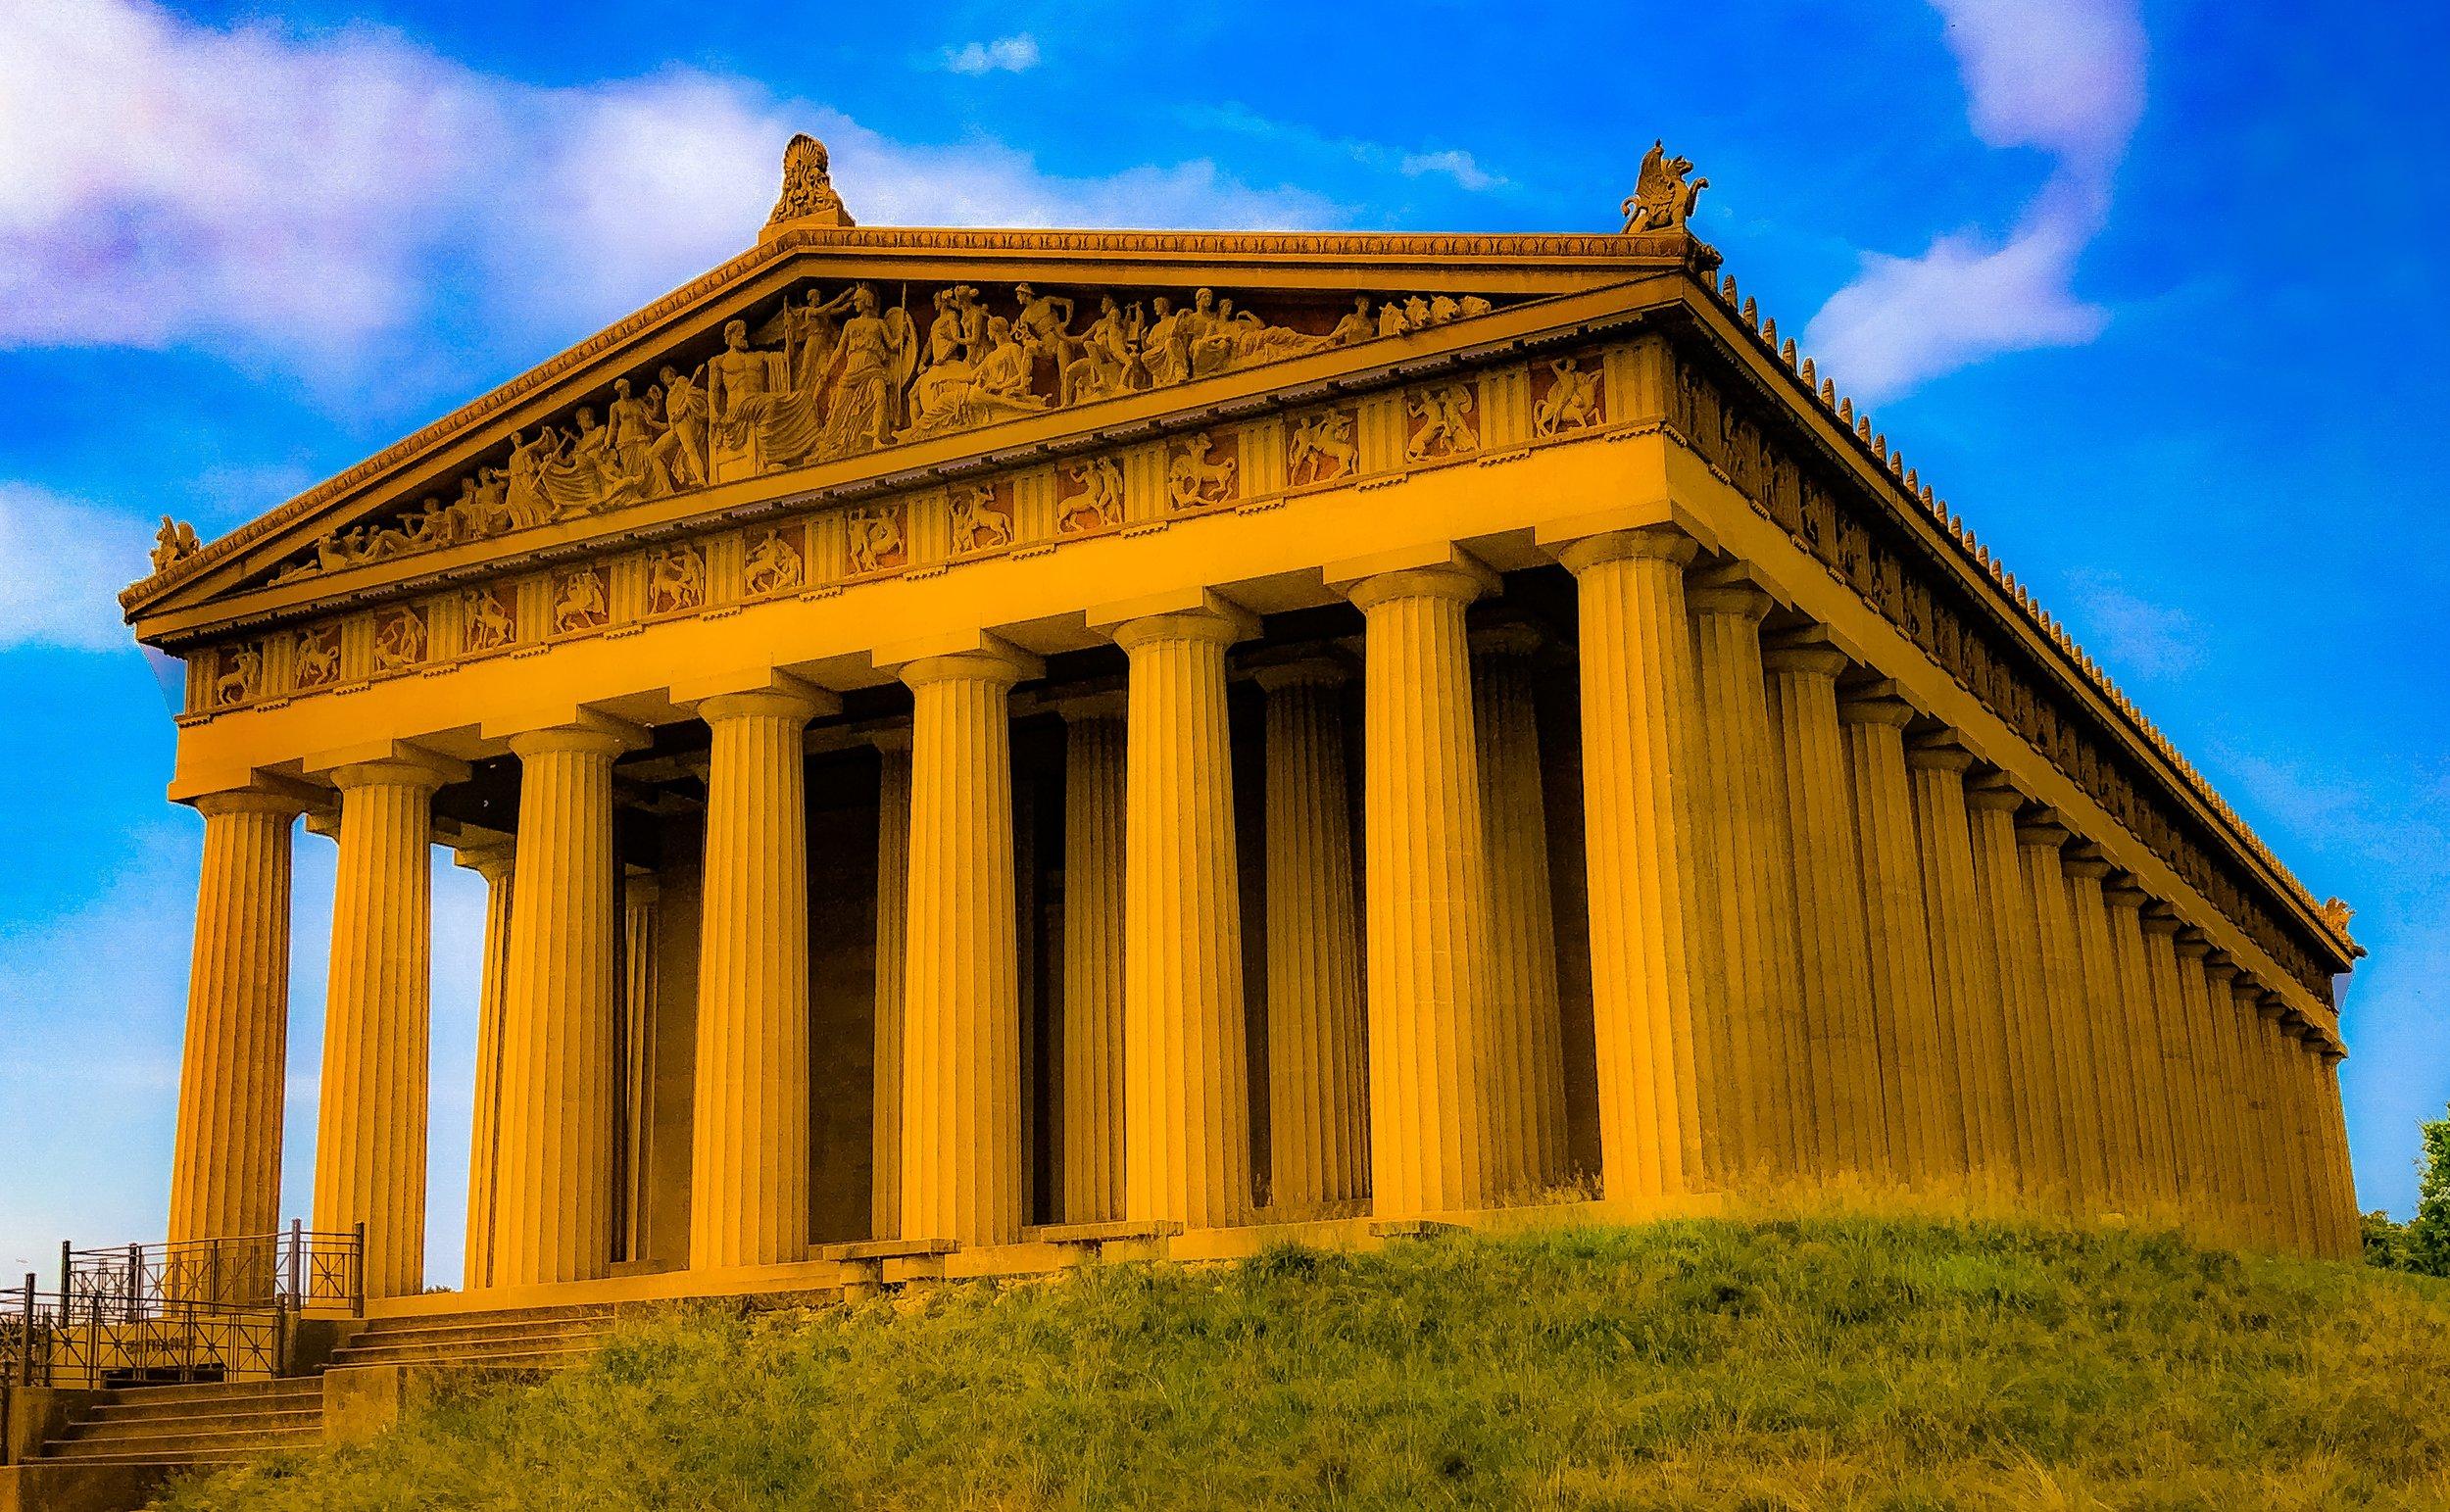 The_Parthenon_-_Nashville.jpg